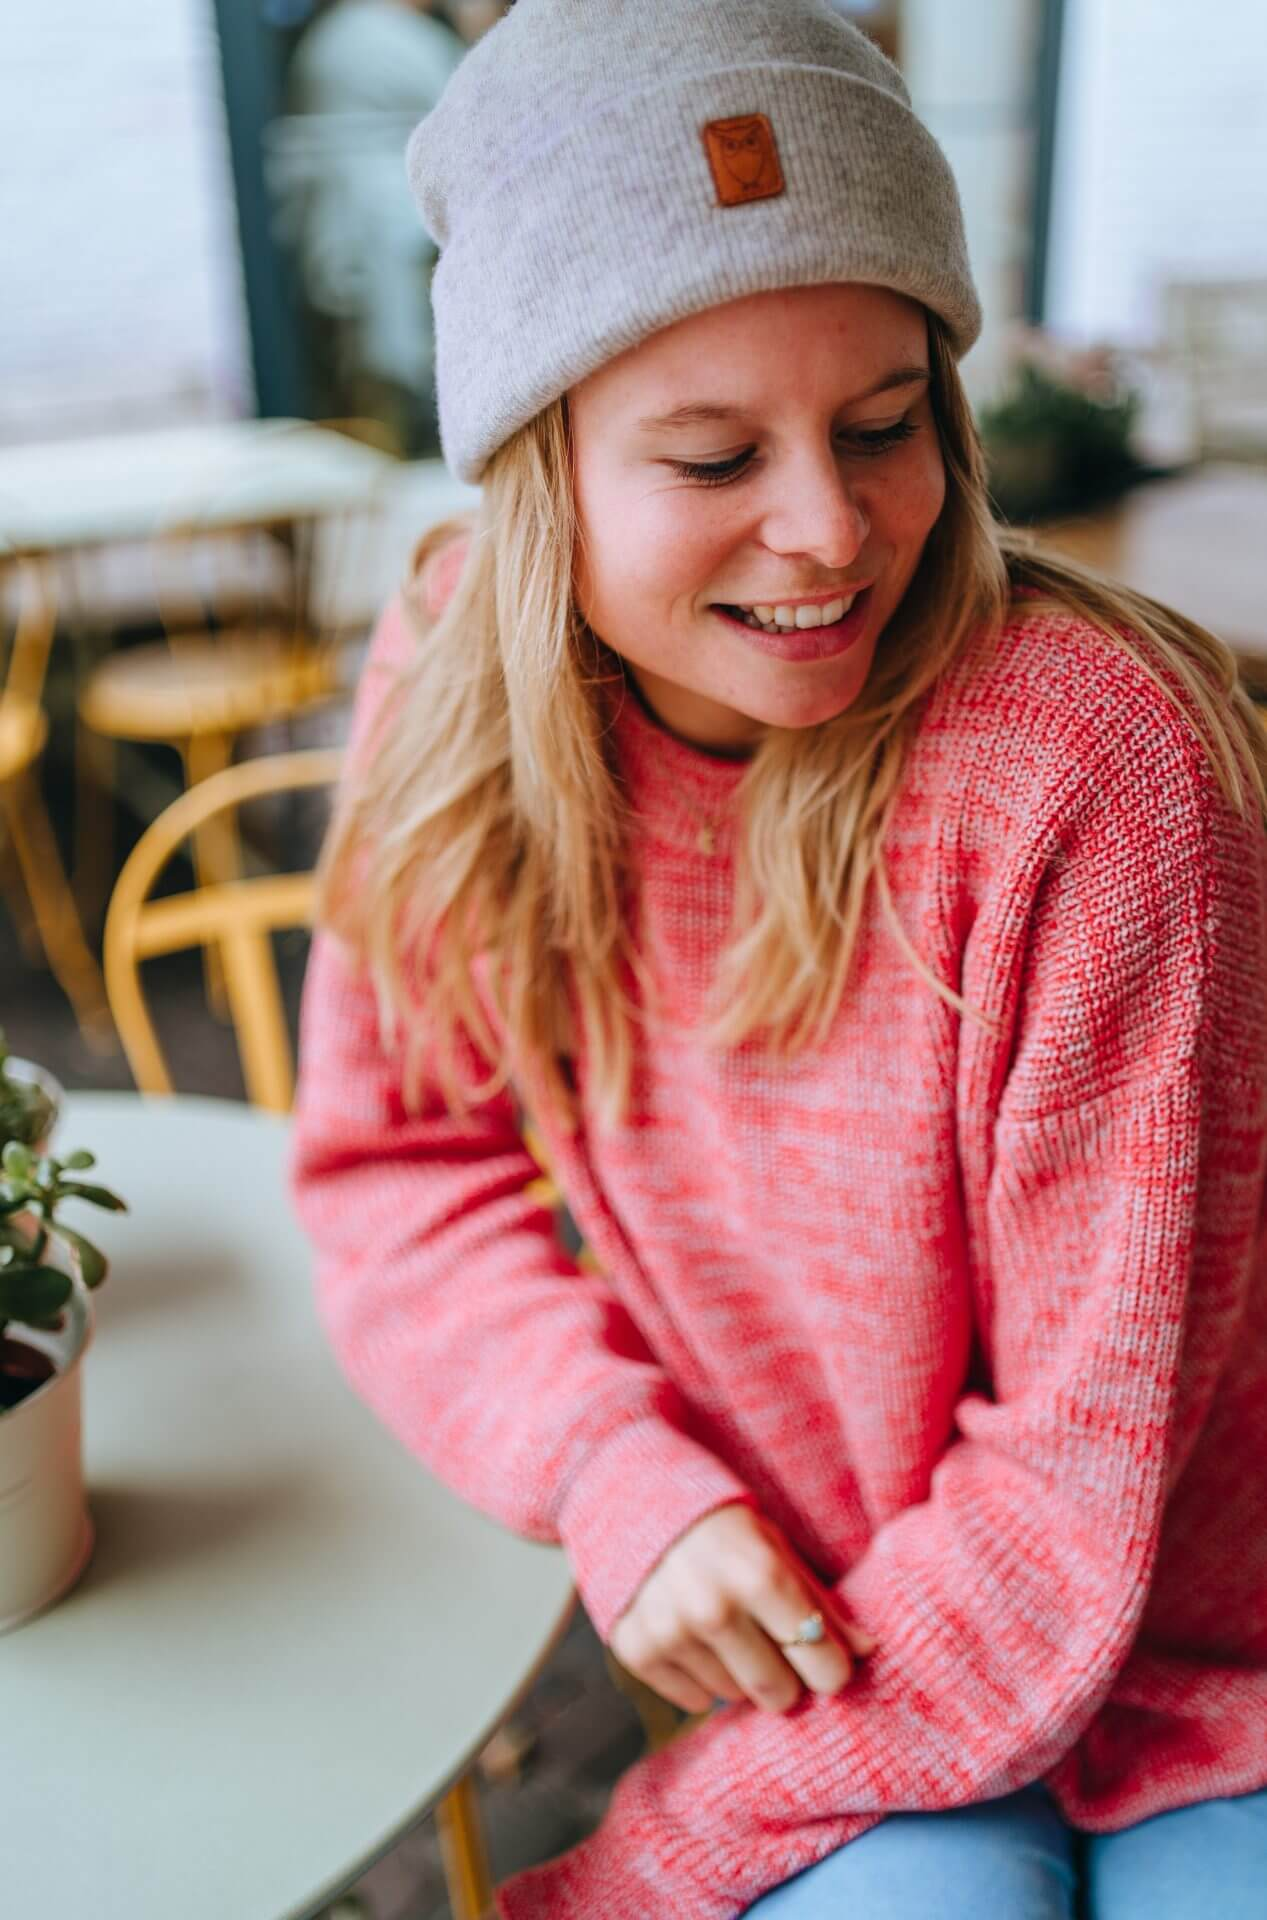 duurzame-kledingmerken